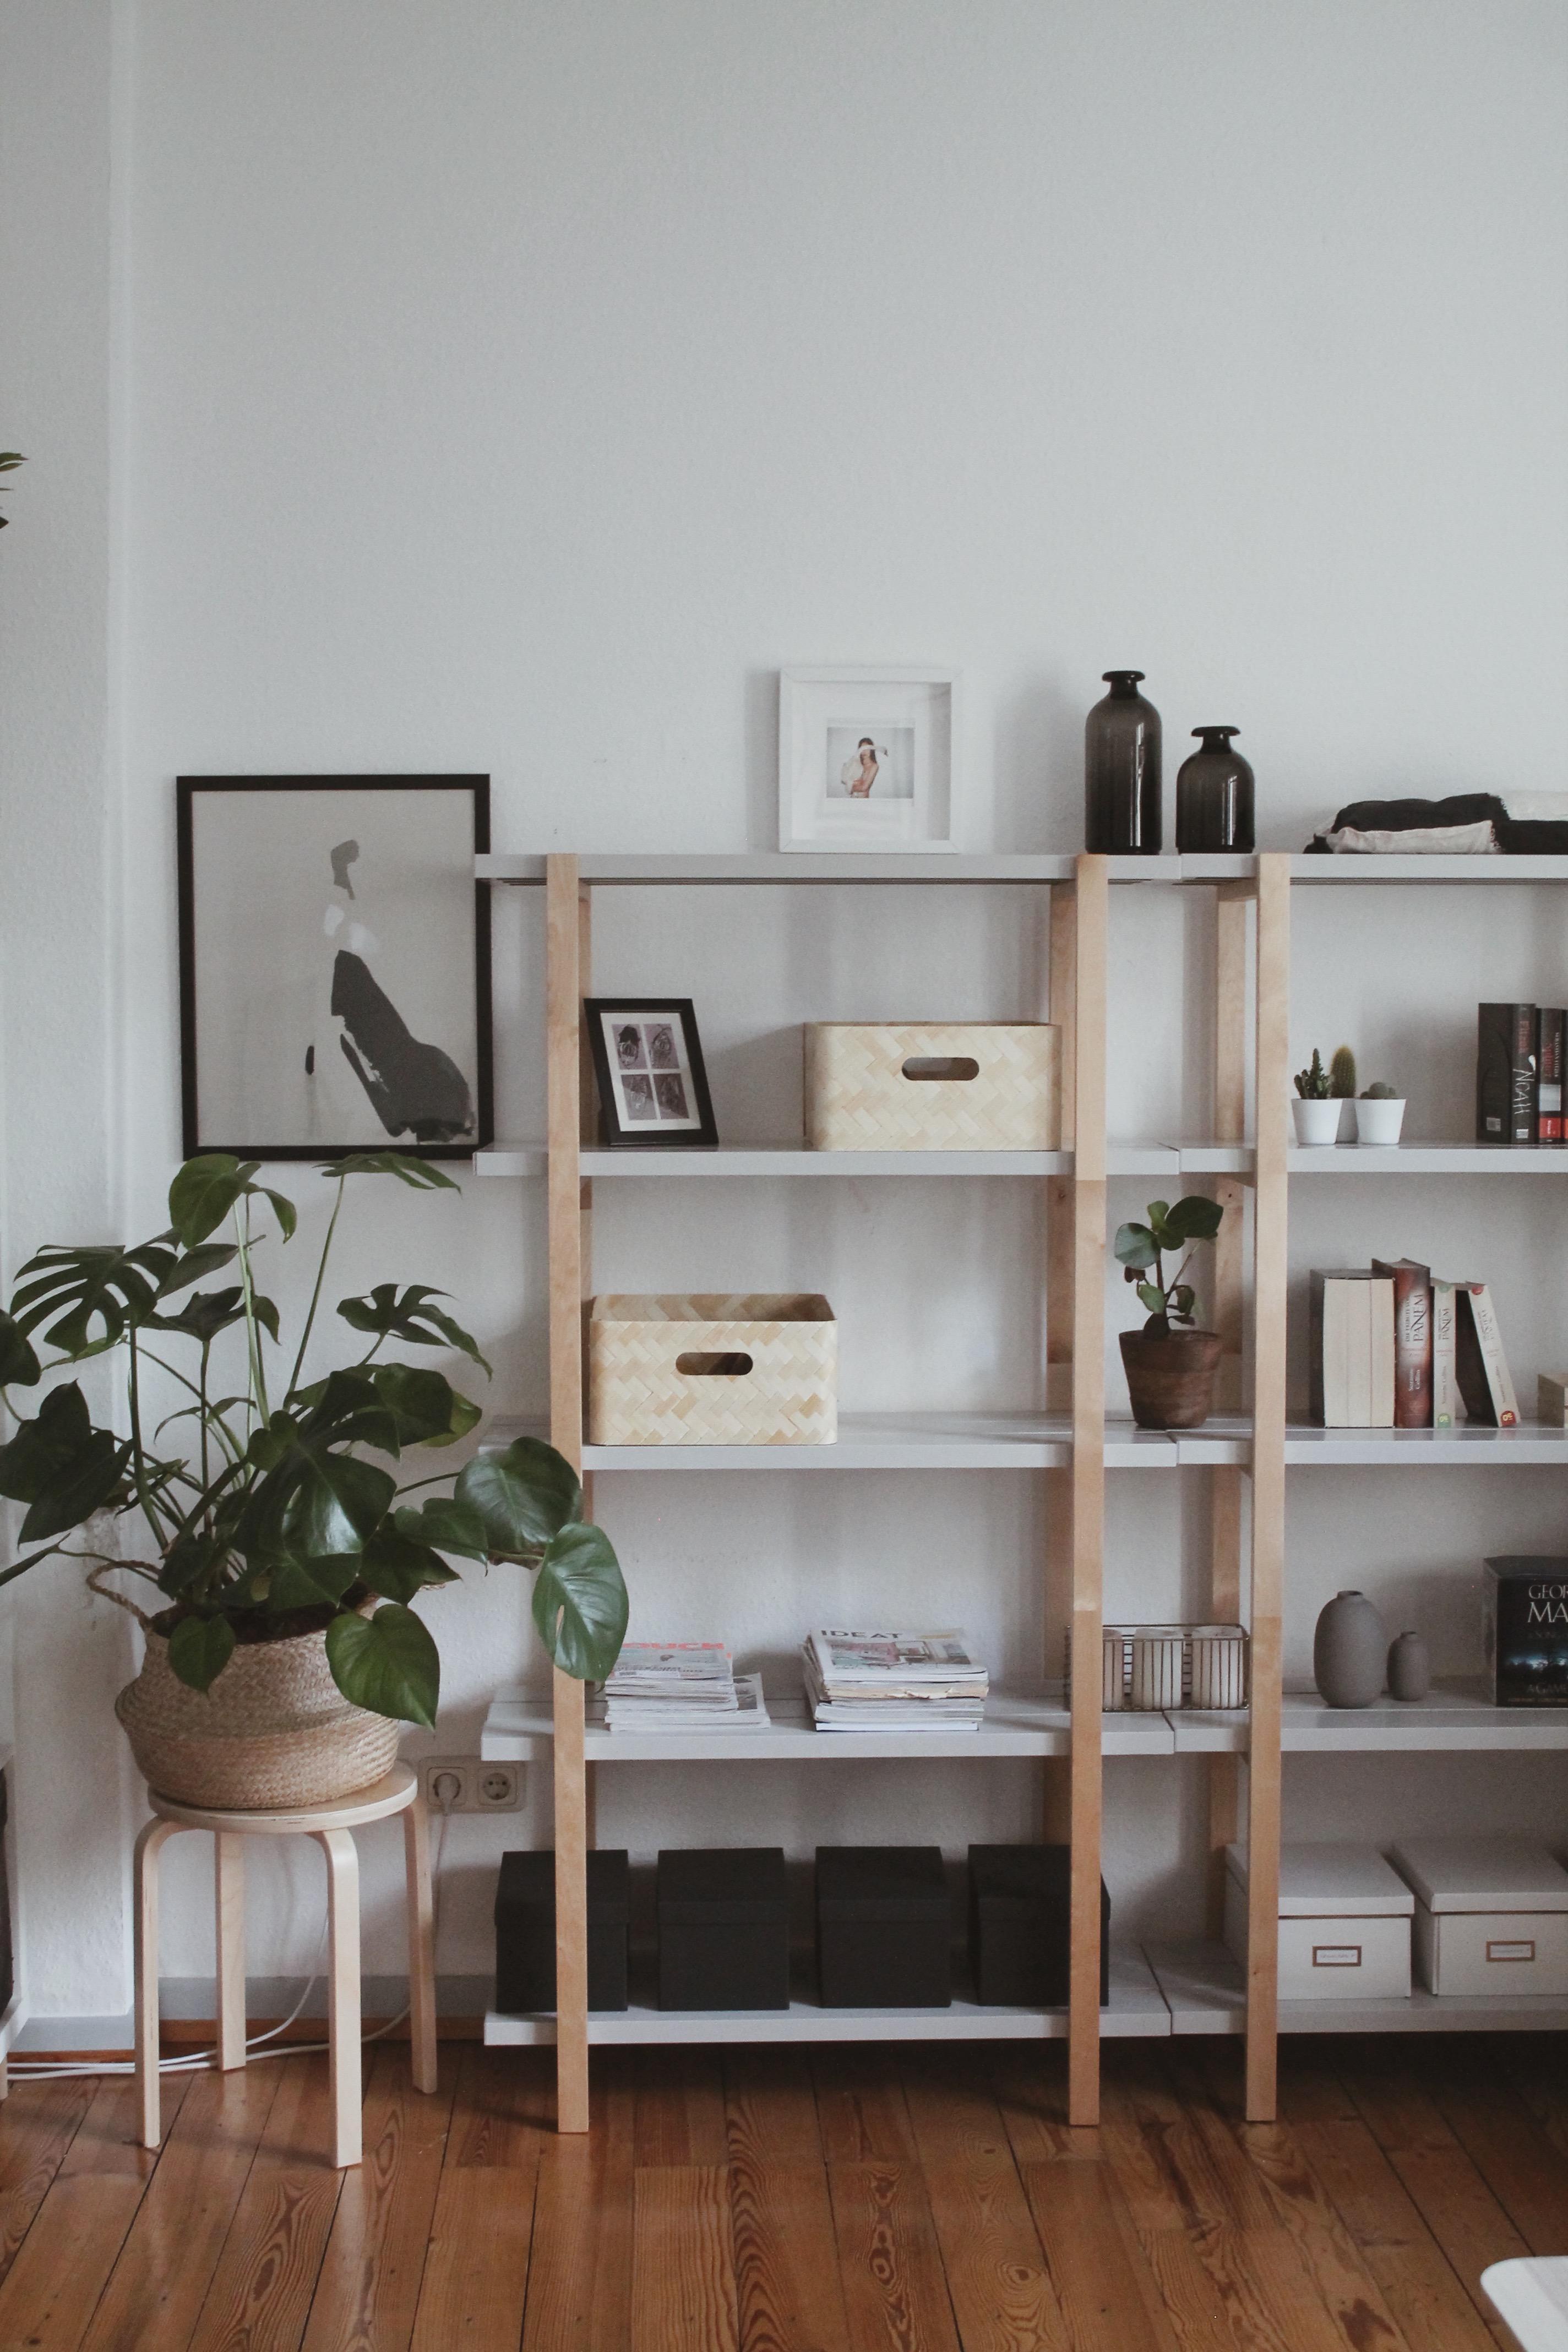 regale dekorativ gestalten inspiration bei couch. Black Bedroom Furniture Sets. Home Design Ideas